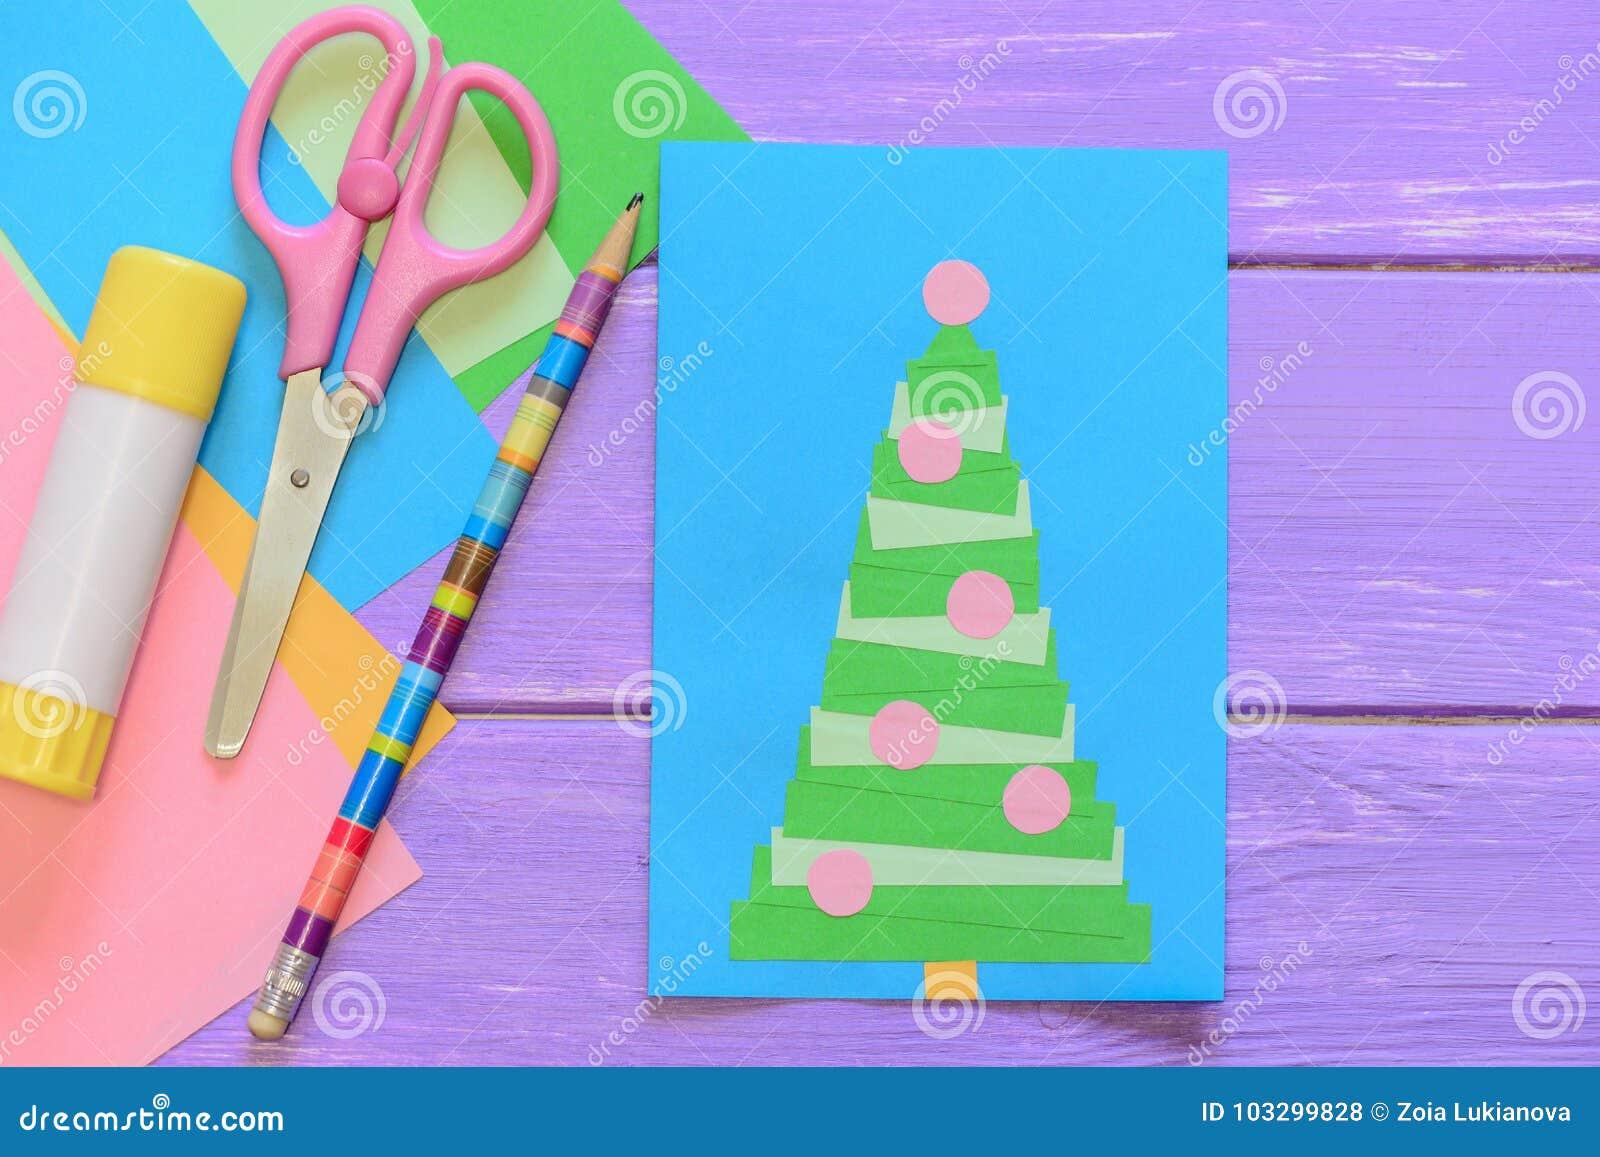 Easy homemade christmas card scissors glue stick pencil colored making christmas card christmas card ideas for toddlers childrens christmas cards creating christmas card simple greeting card design m4hsunfo